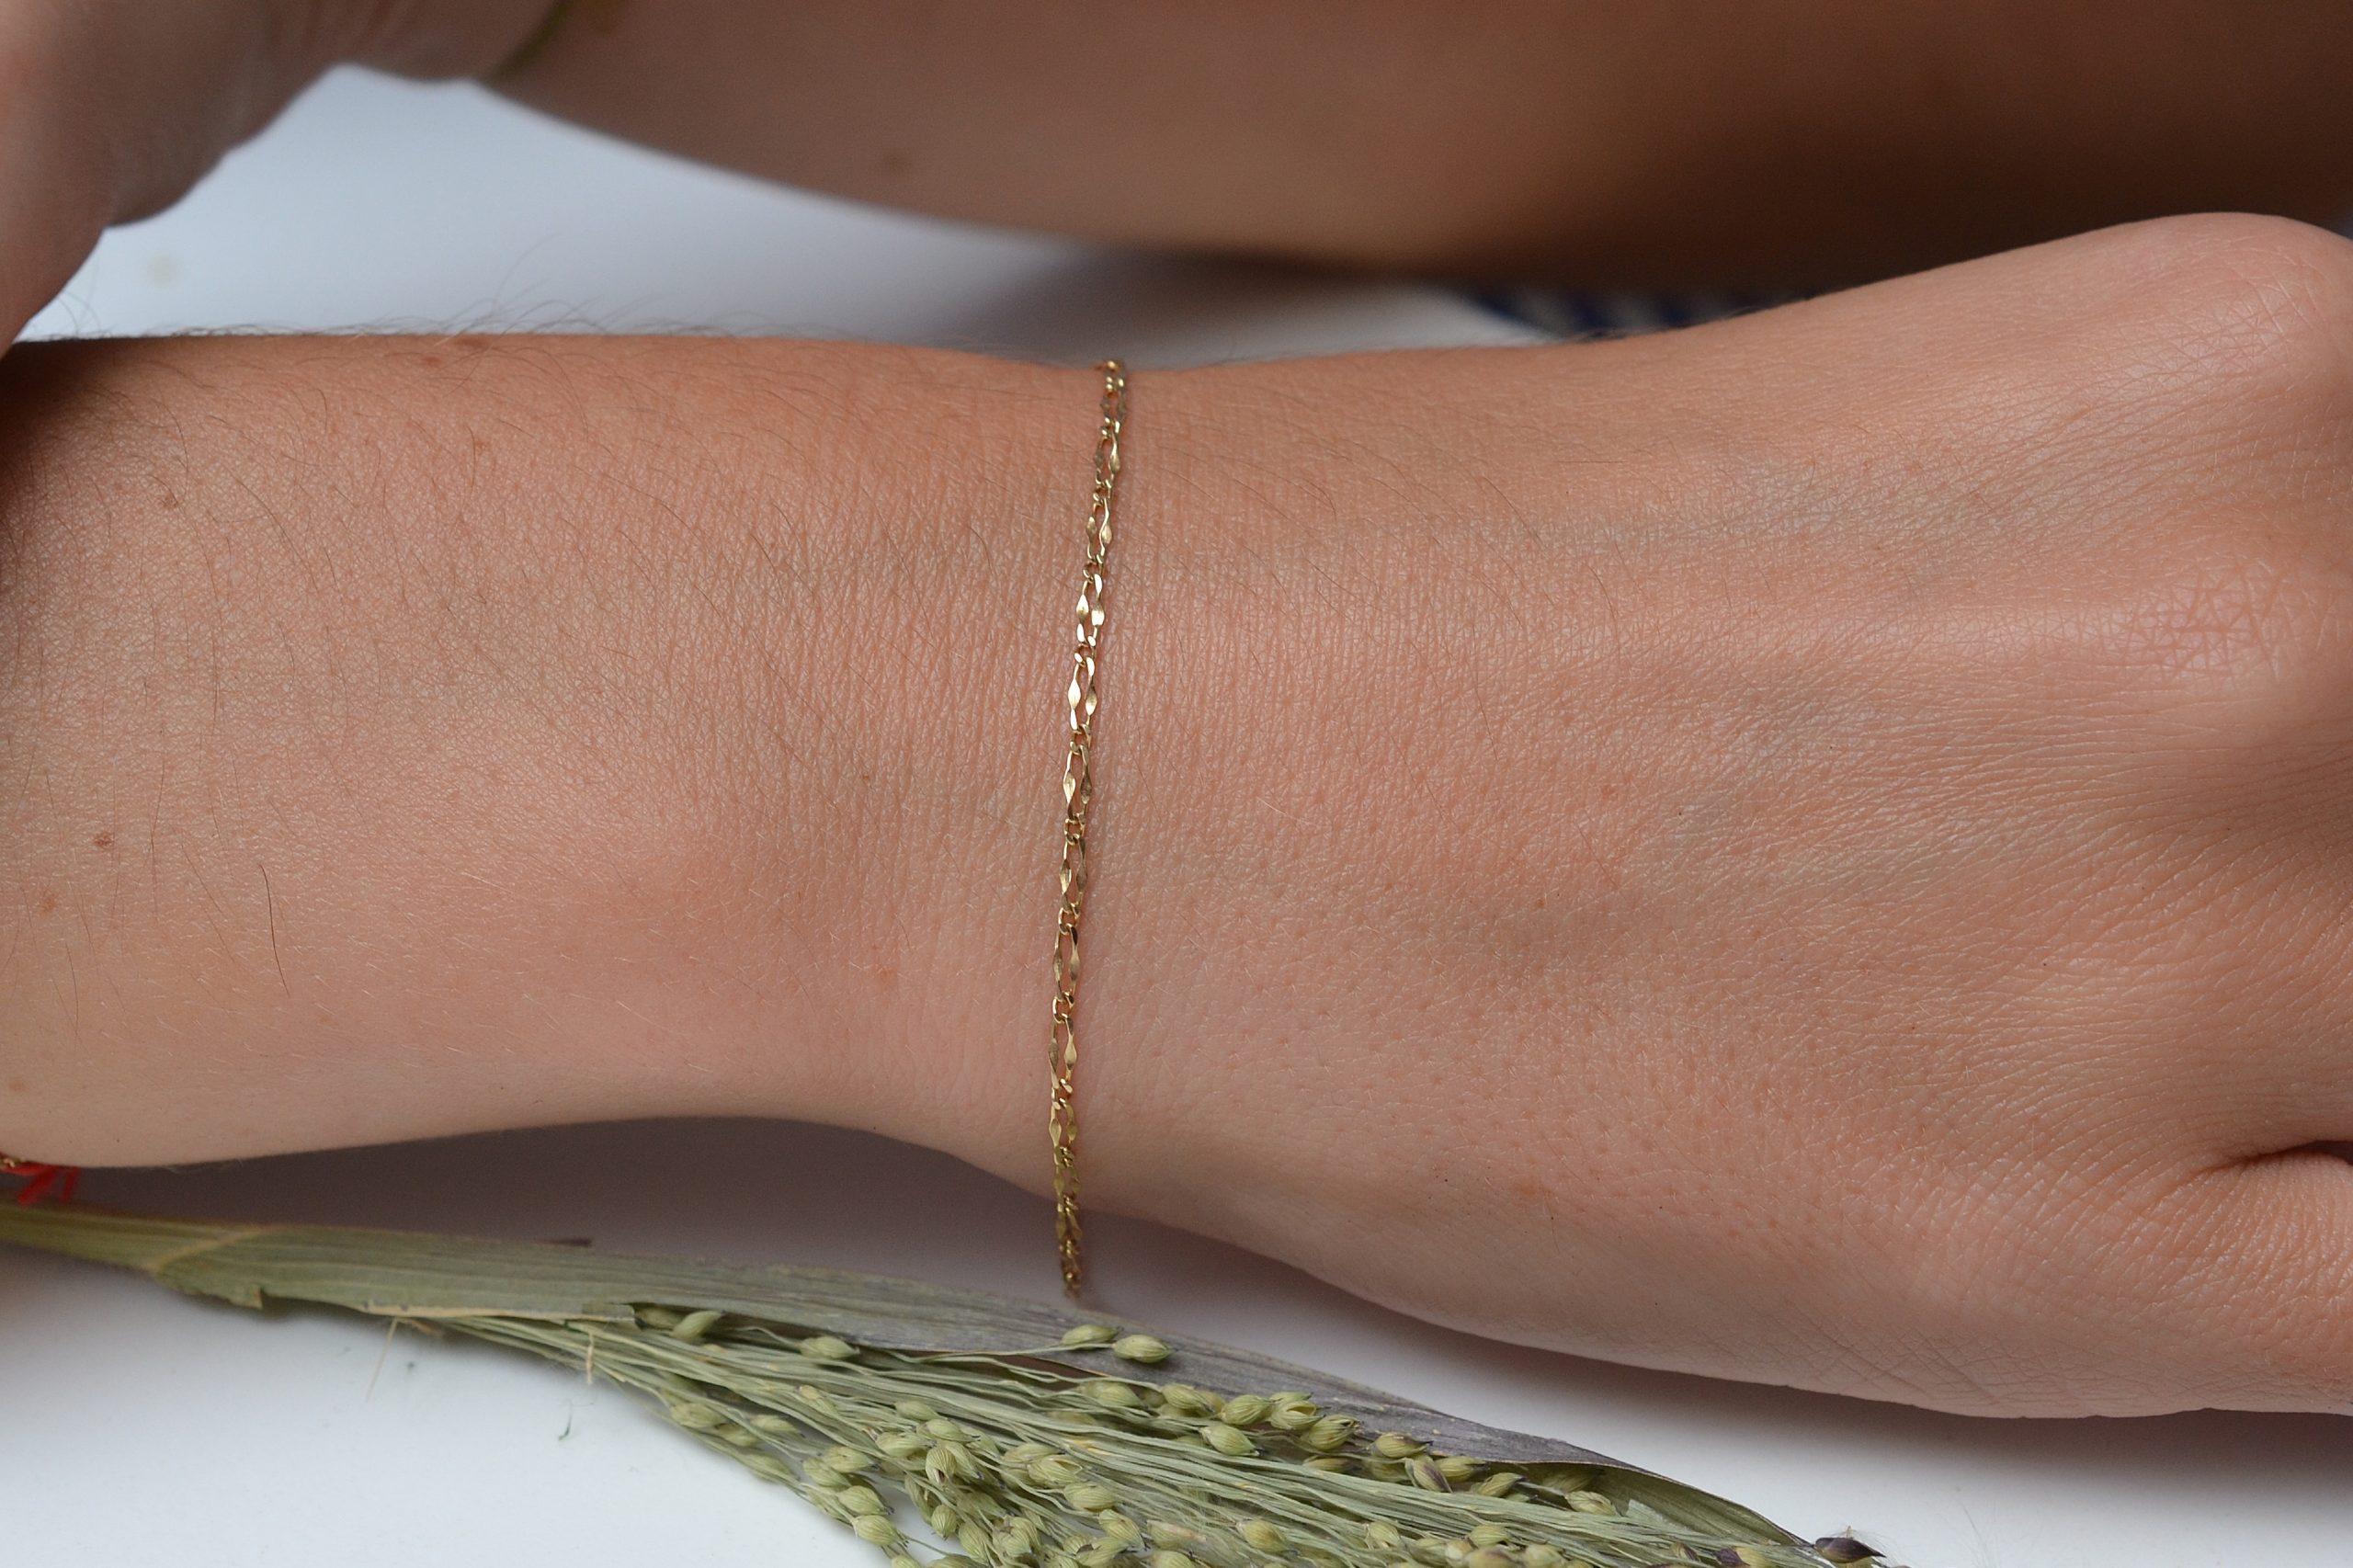 Fin bracelet en Or jaune, maille figaro alternee (1x1) et torsadee - bracelet ethique et eco-responsable